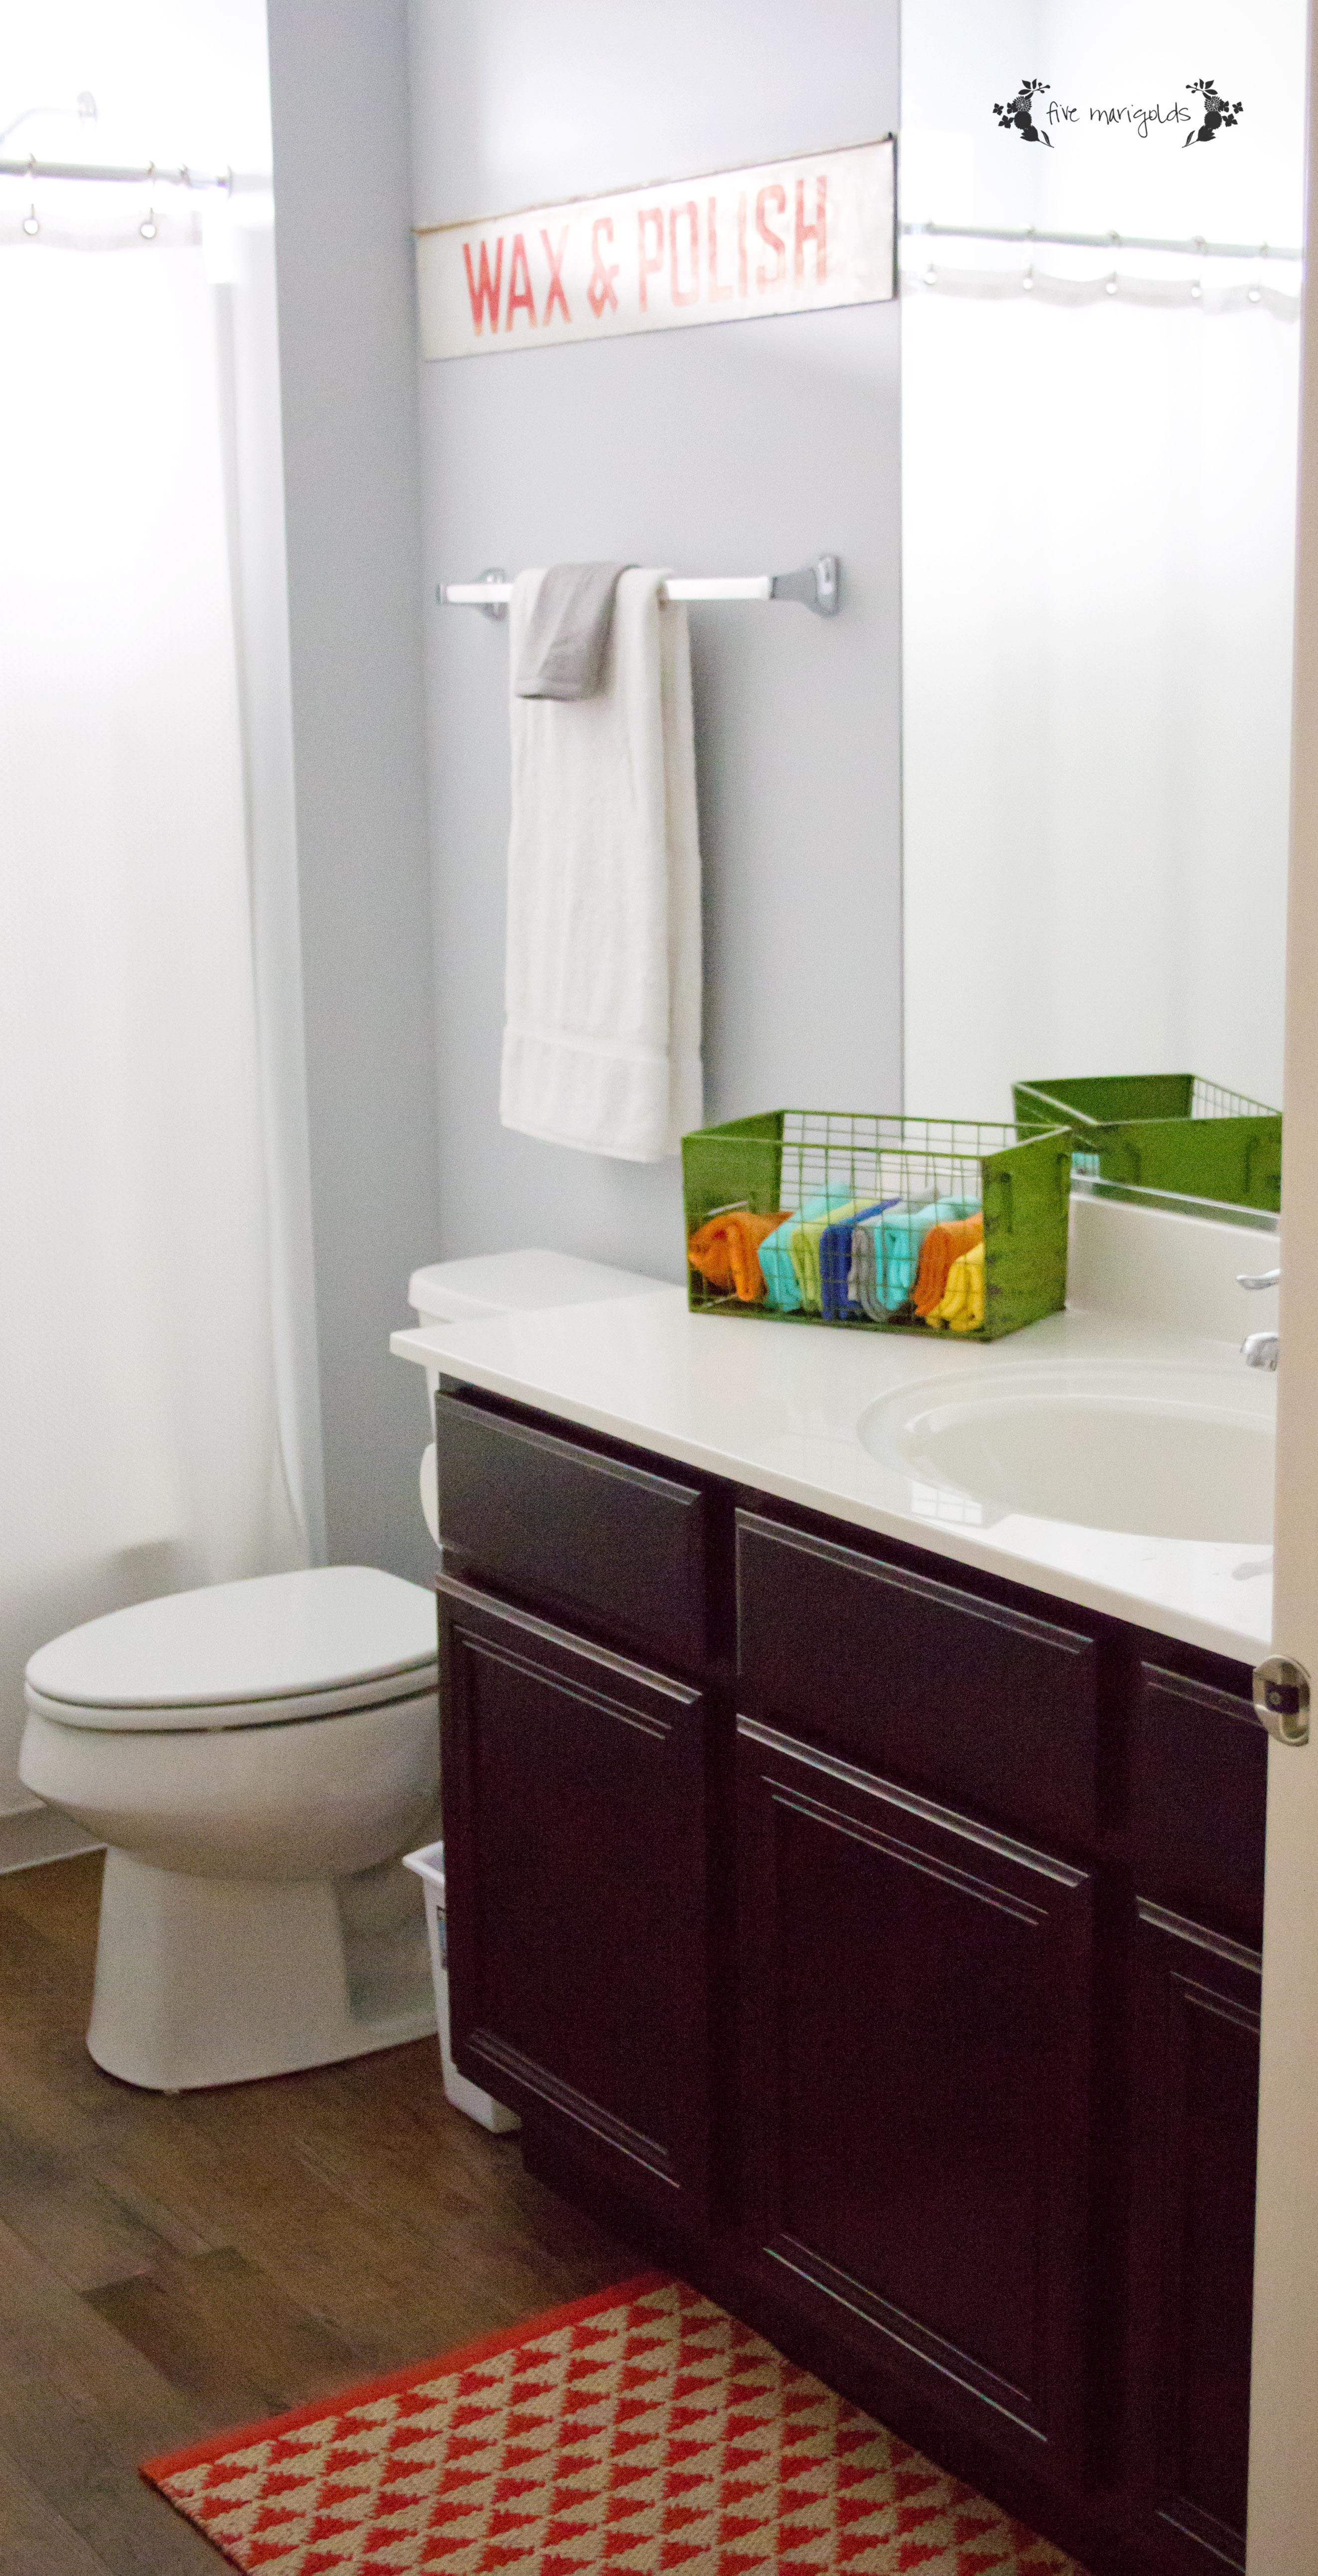 Vintage Star Wars Boy Bathroom | Five Marigolds